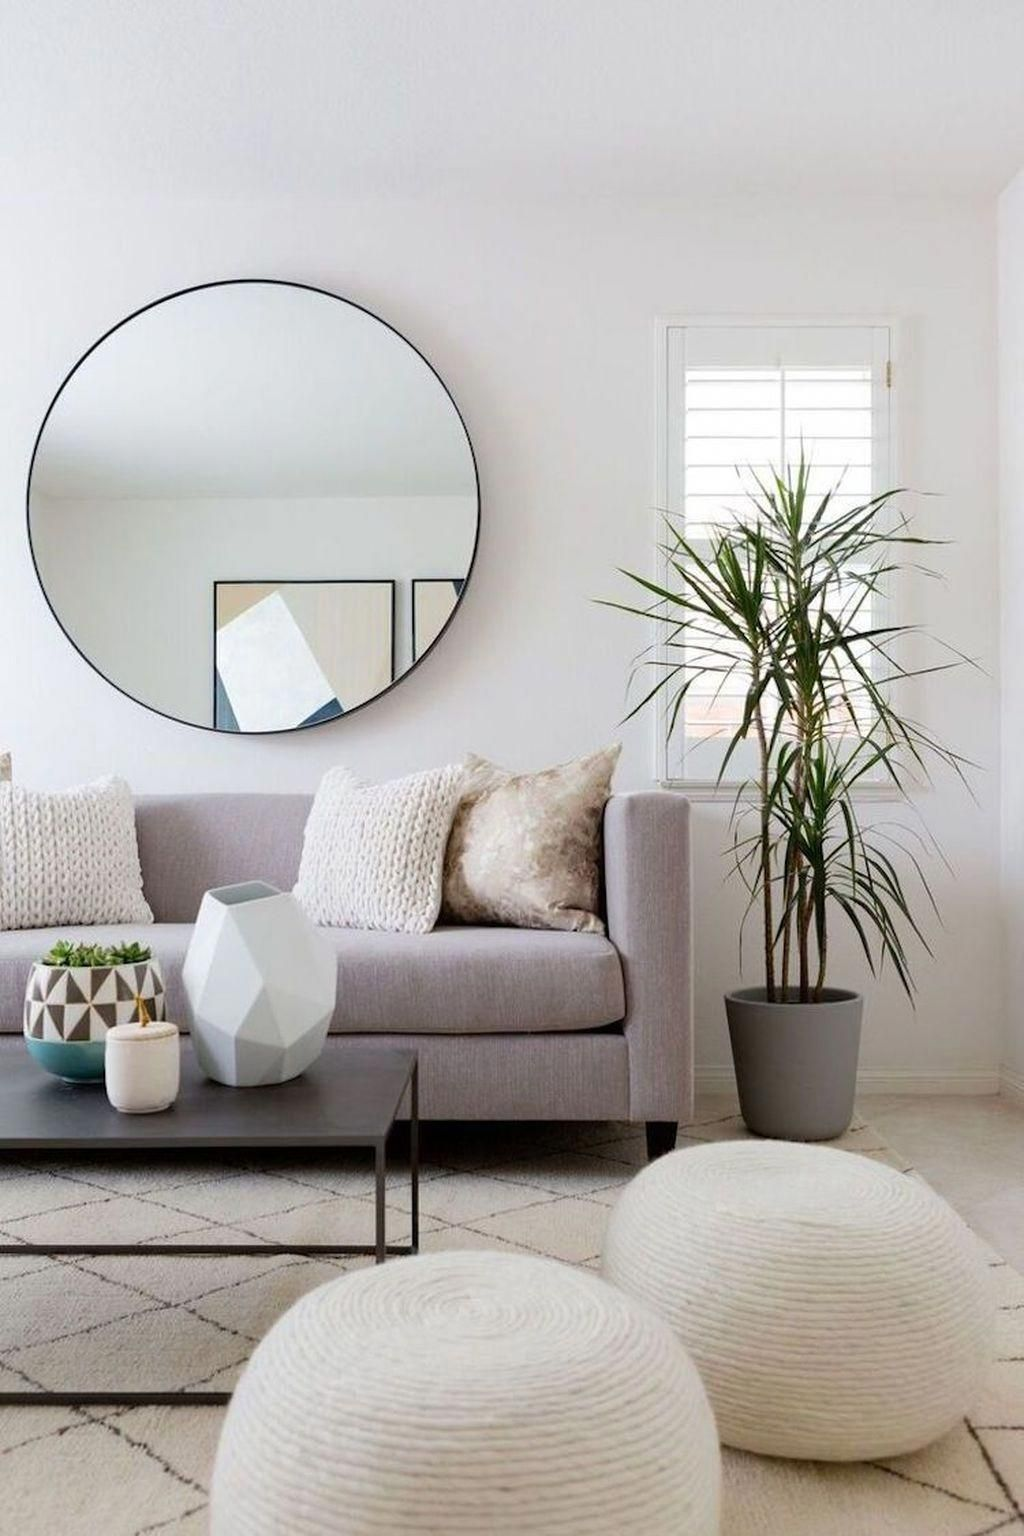 30 Creative Scandinavian Living Room Ideas Homeinteriordesign Cozy Living Room Design Minimalist Living Room Living Room Scandinavian